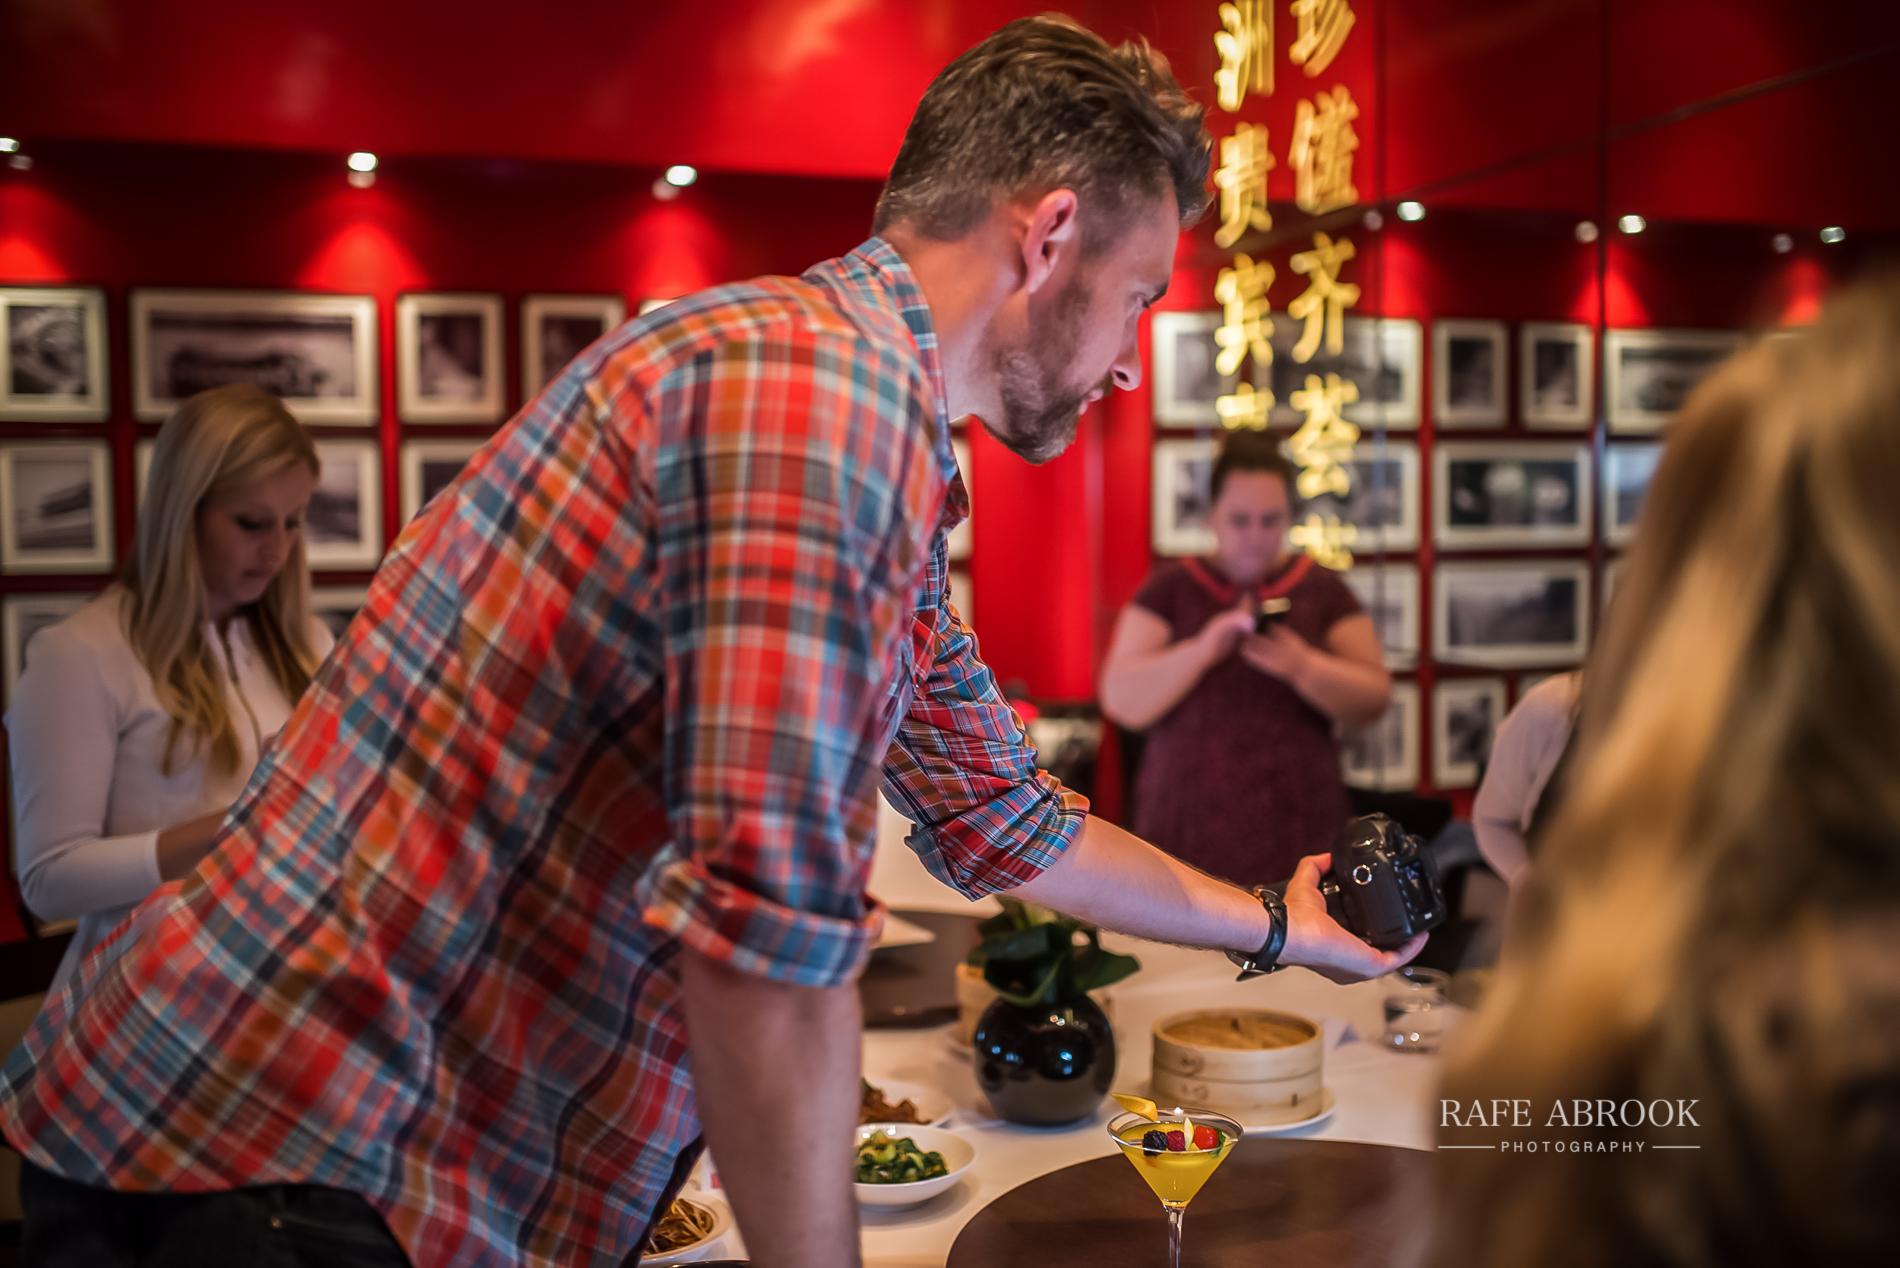 min jiang food blogger rafe abrook photography training-1054.jpg